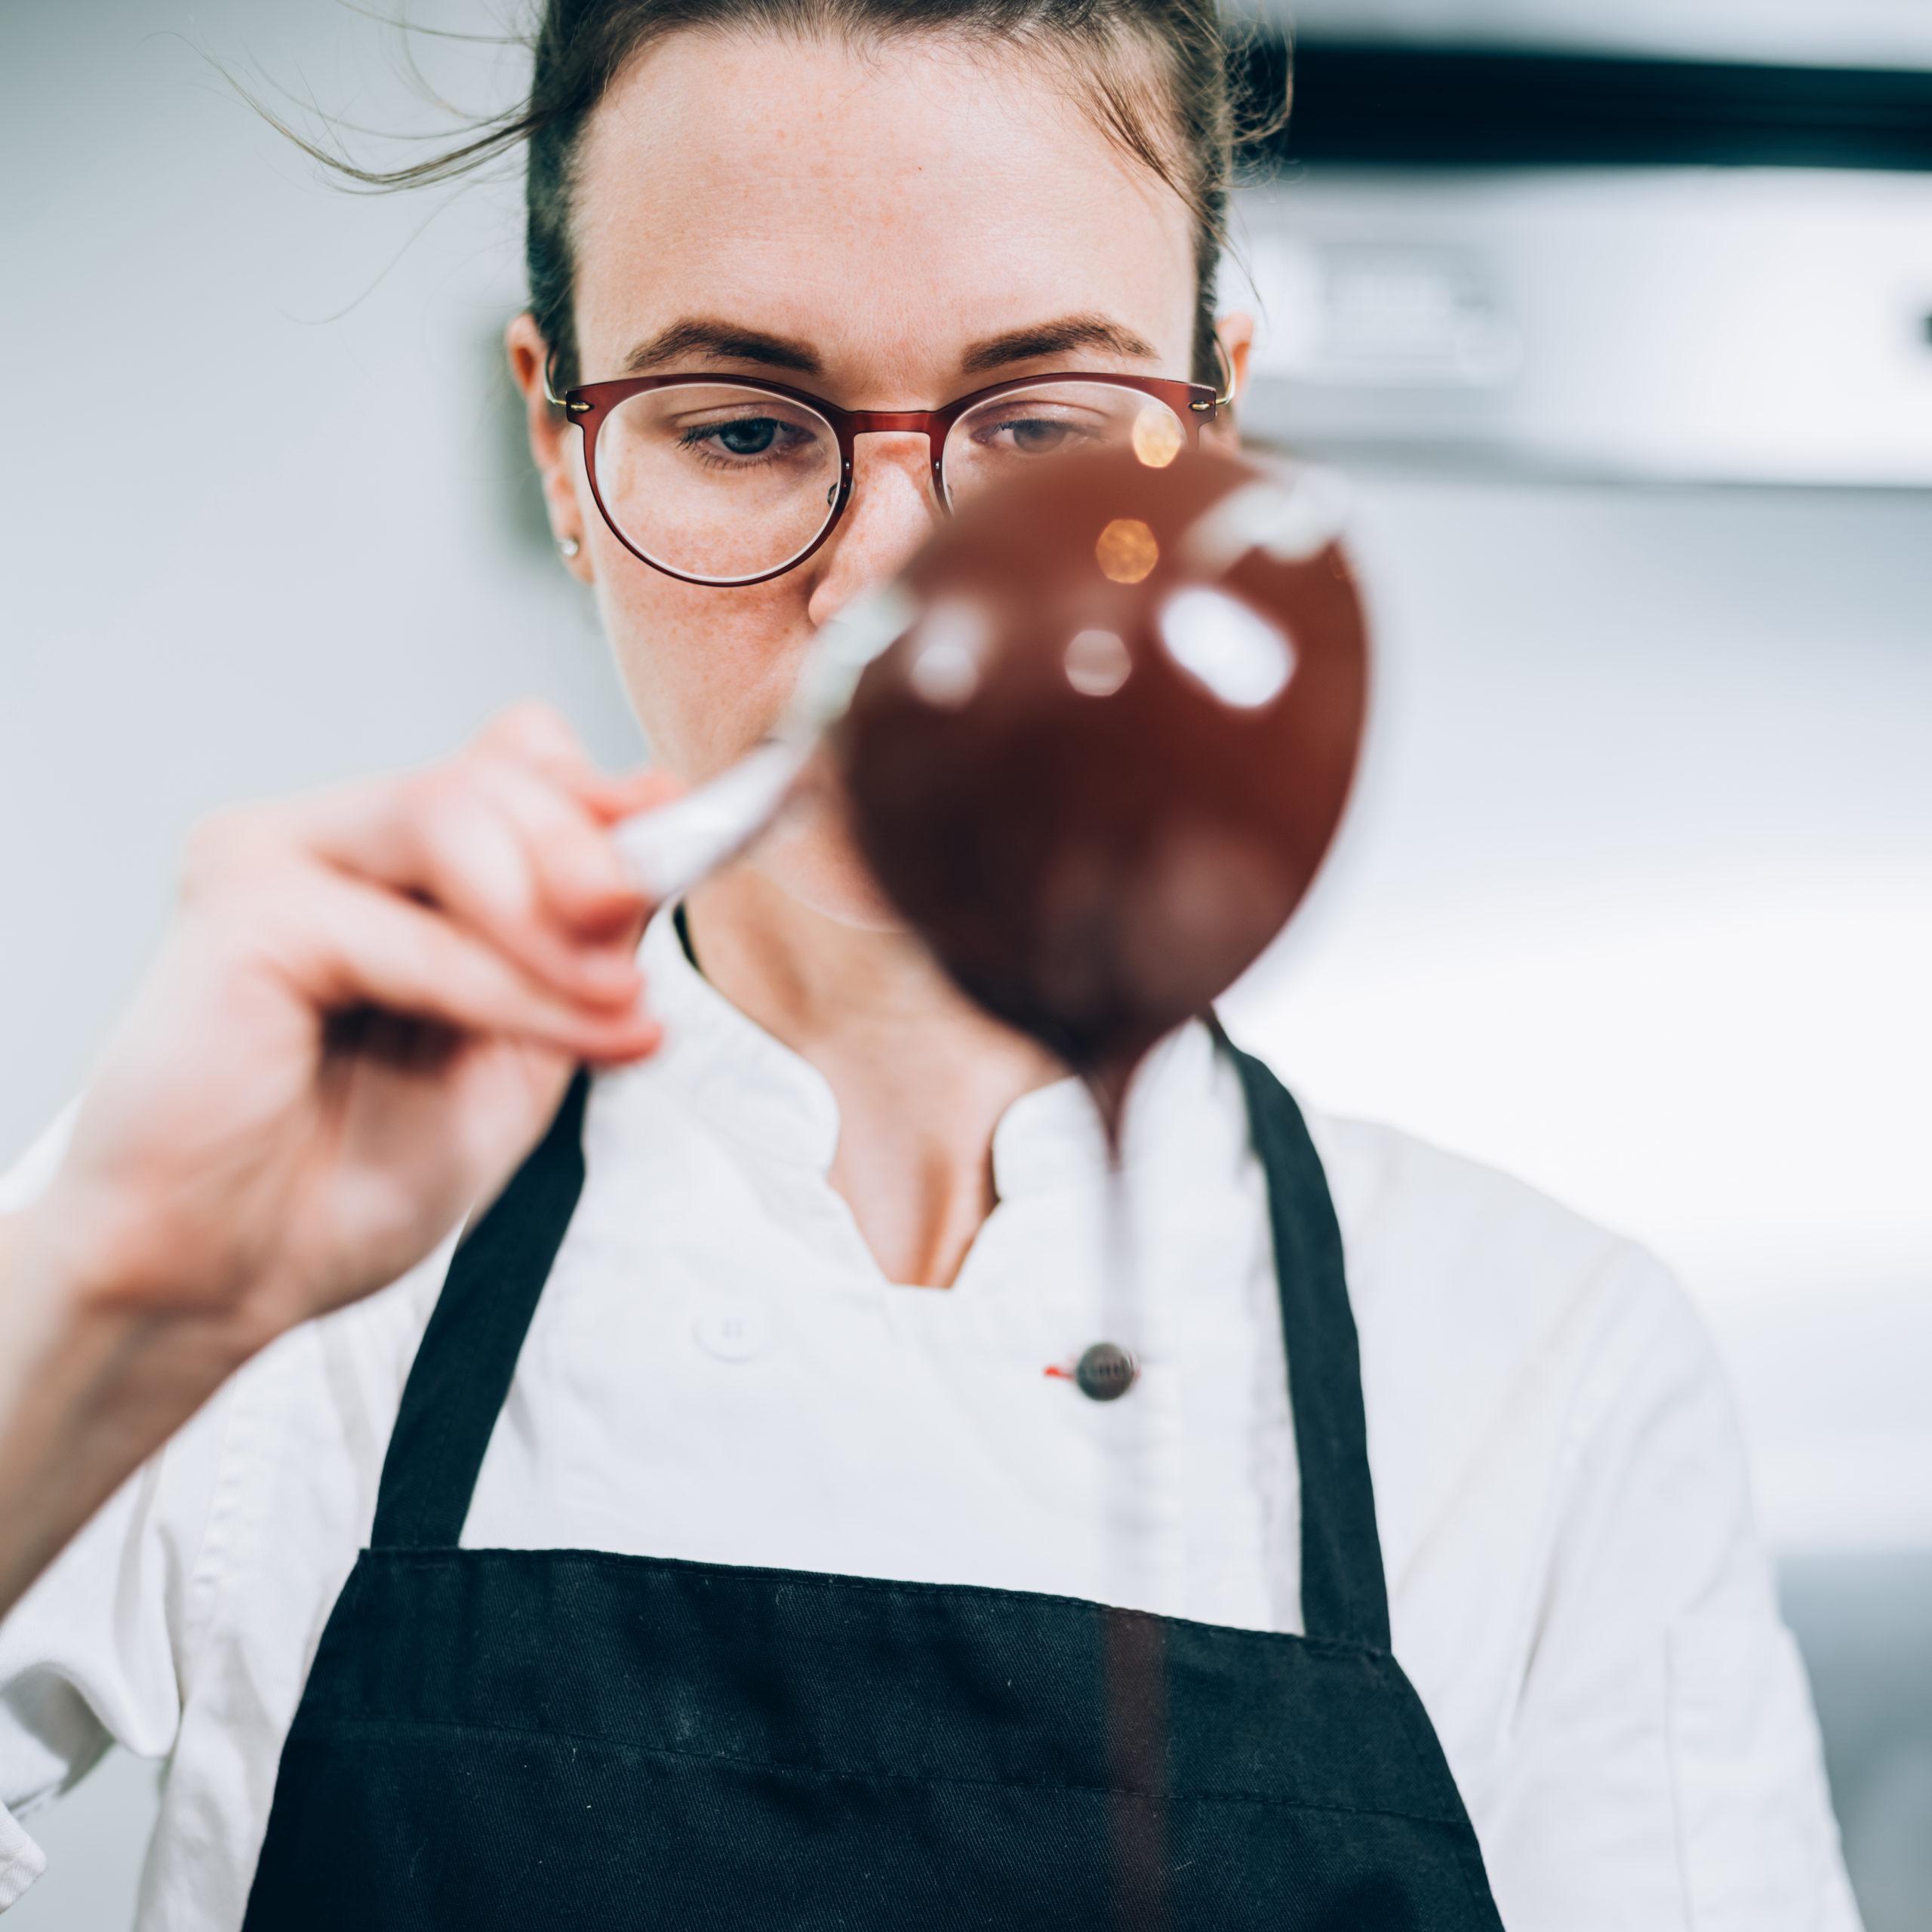 Young Master Chocolatier